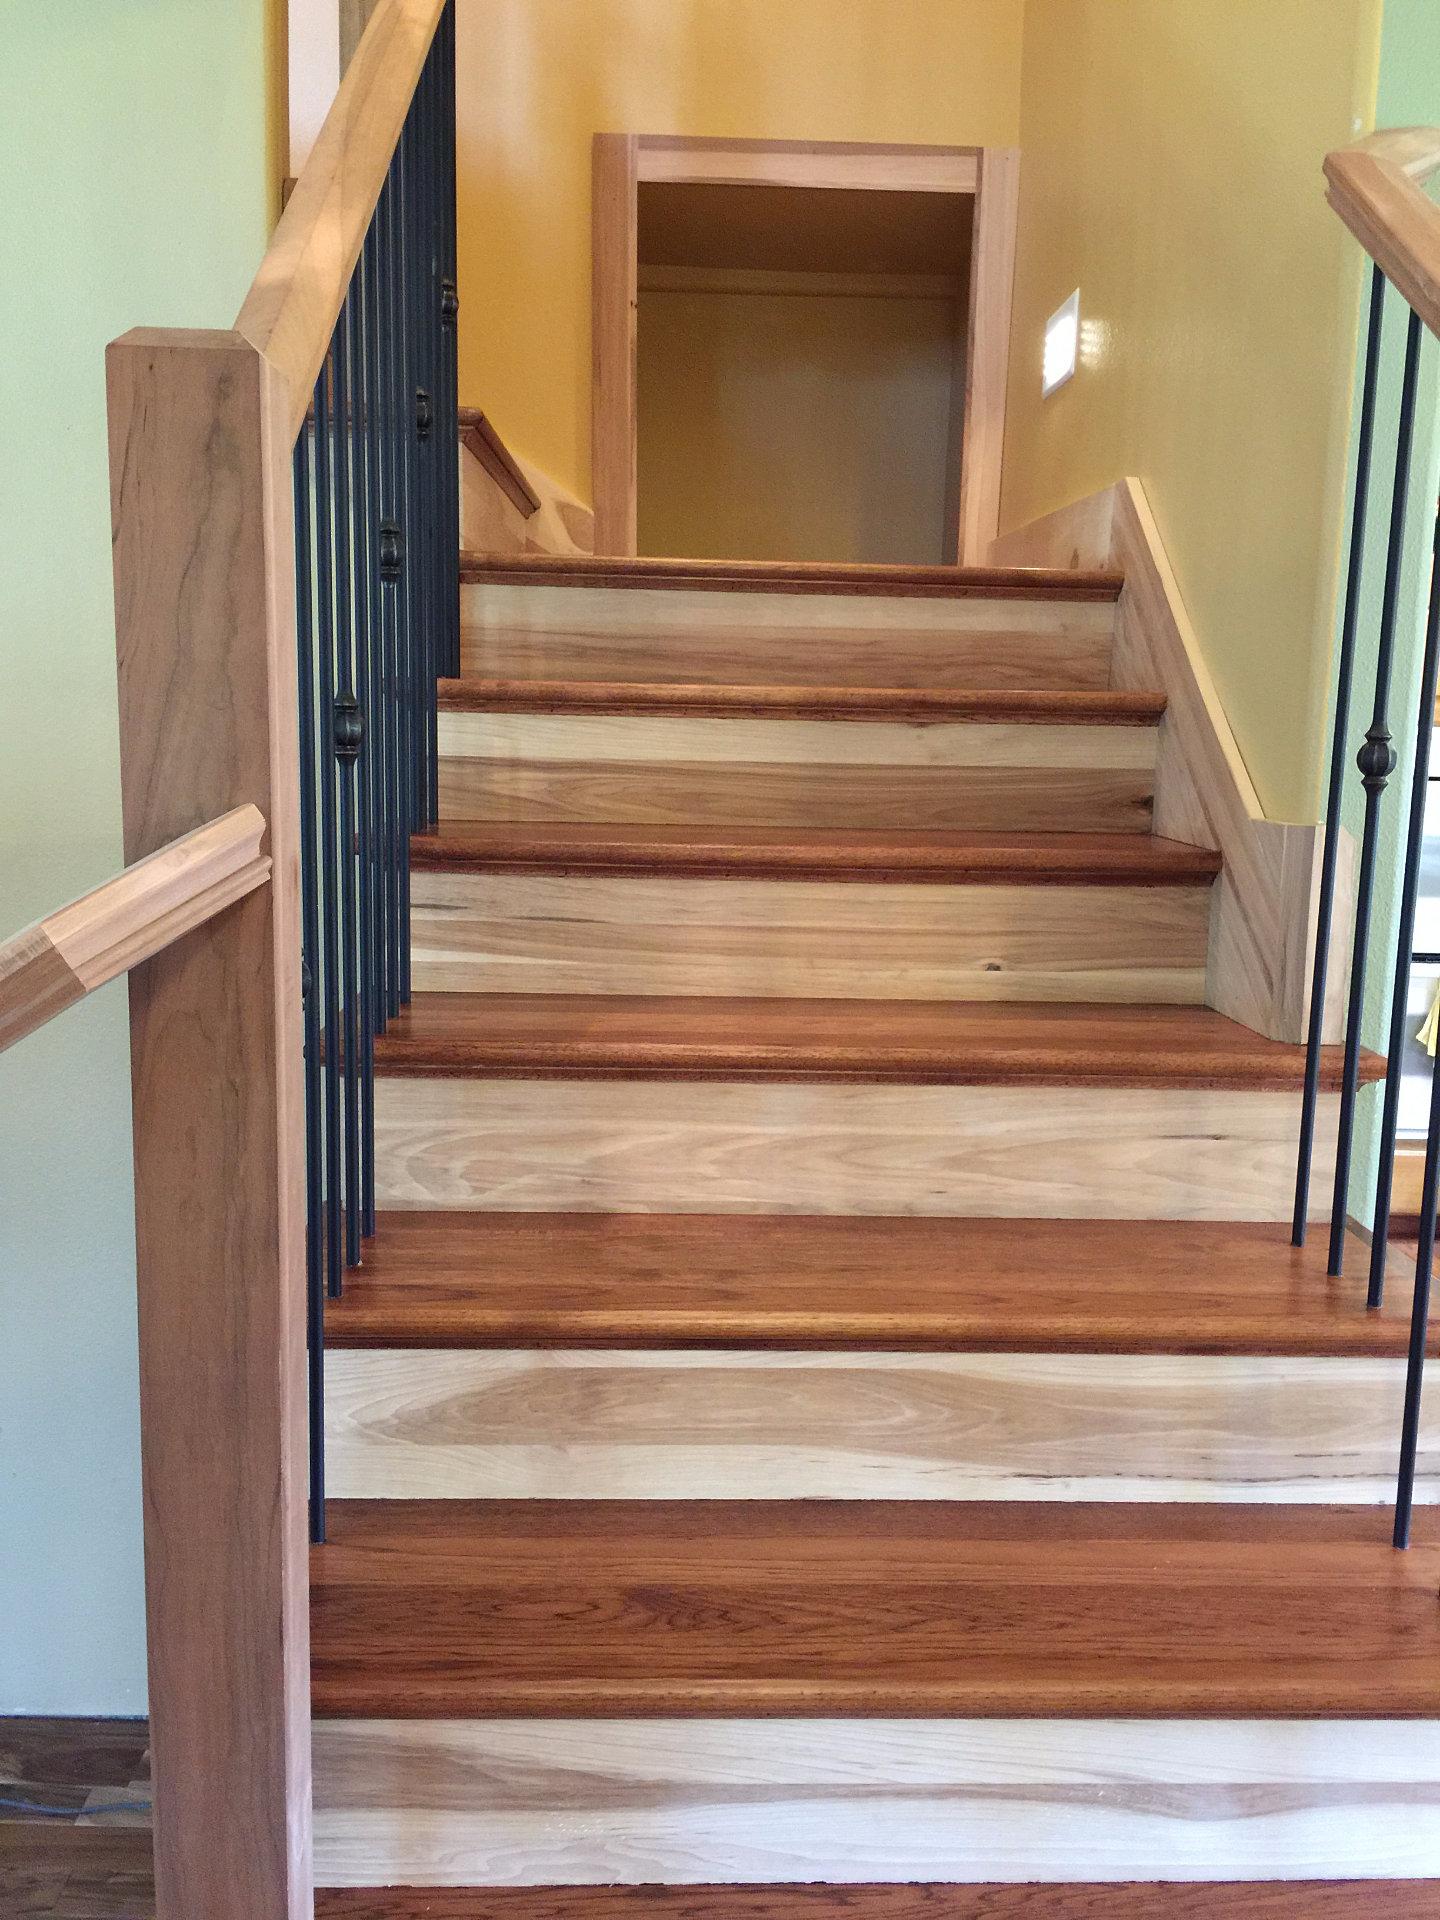 Northwest wood floors full service hardwood flooring for Northwest flooring